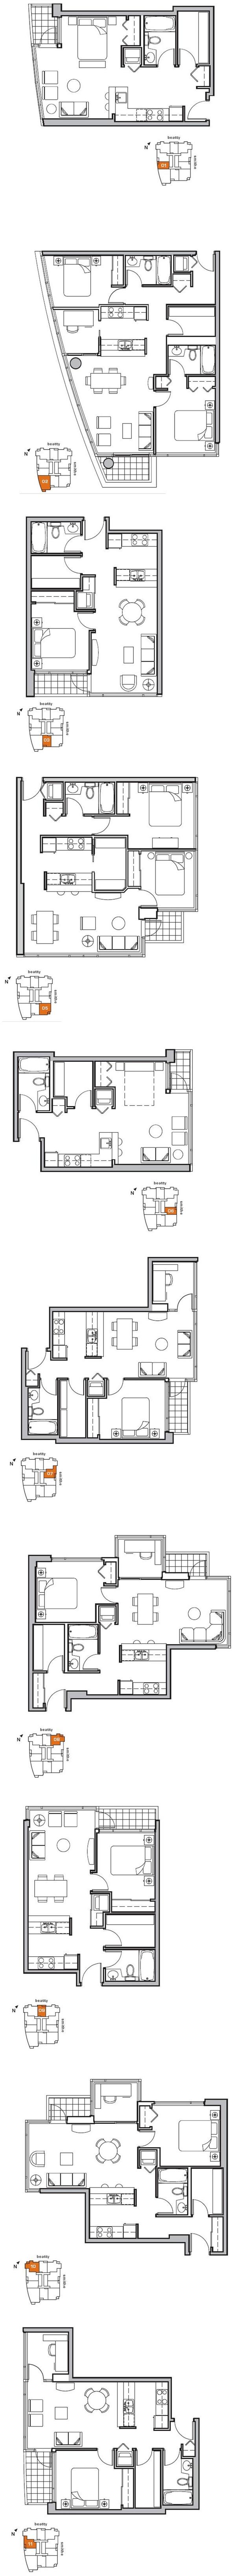 928 beatty floor plans (JPG)